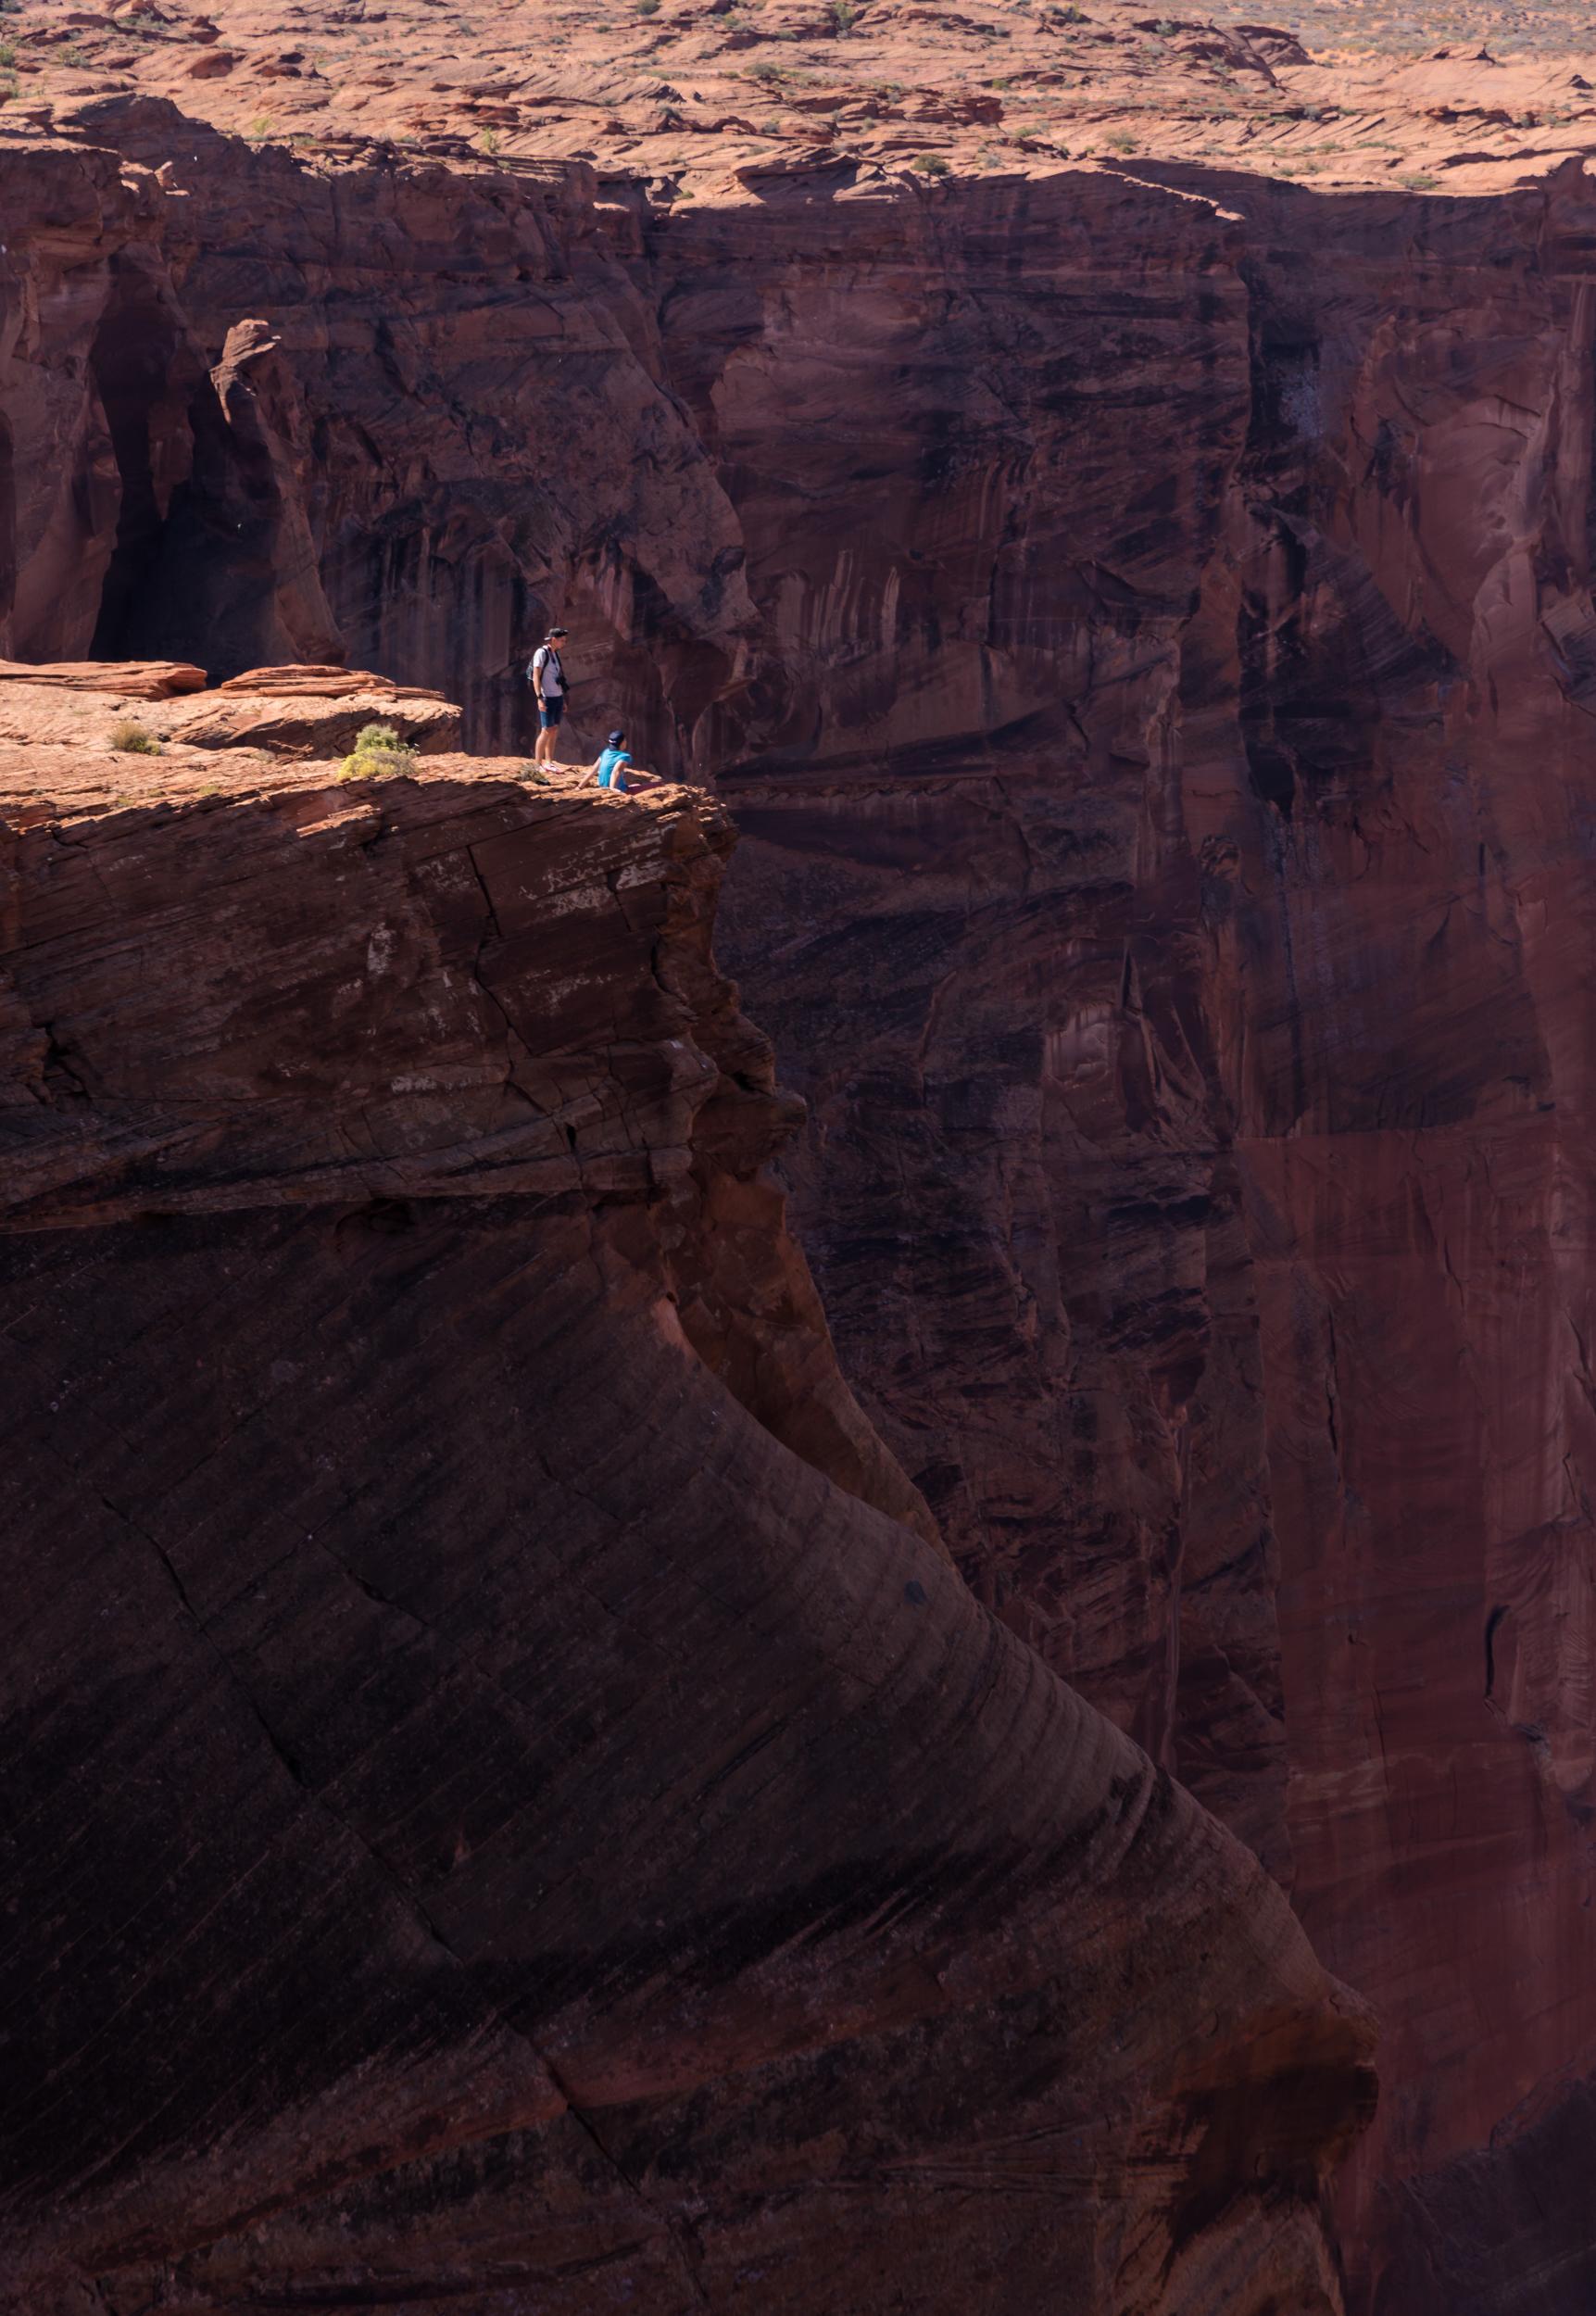 The Edge of Horseshoe Bend